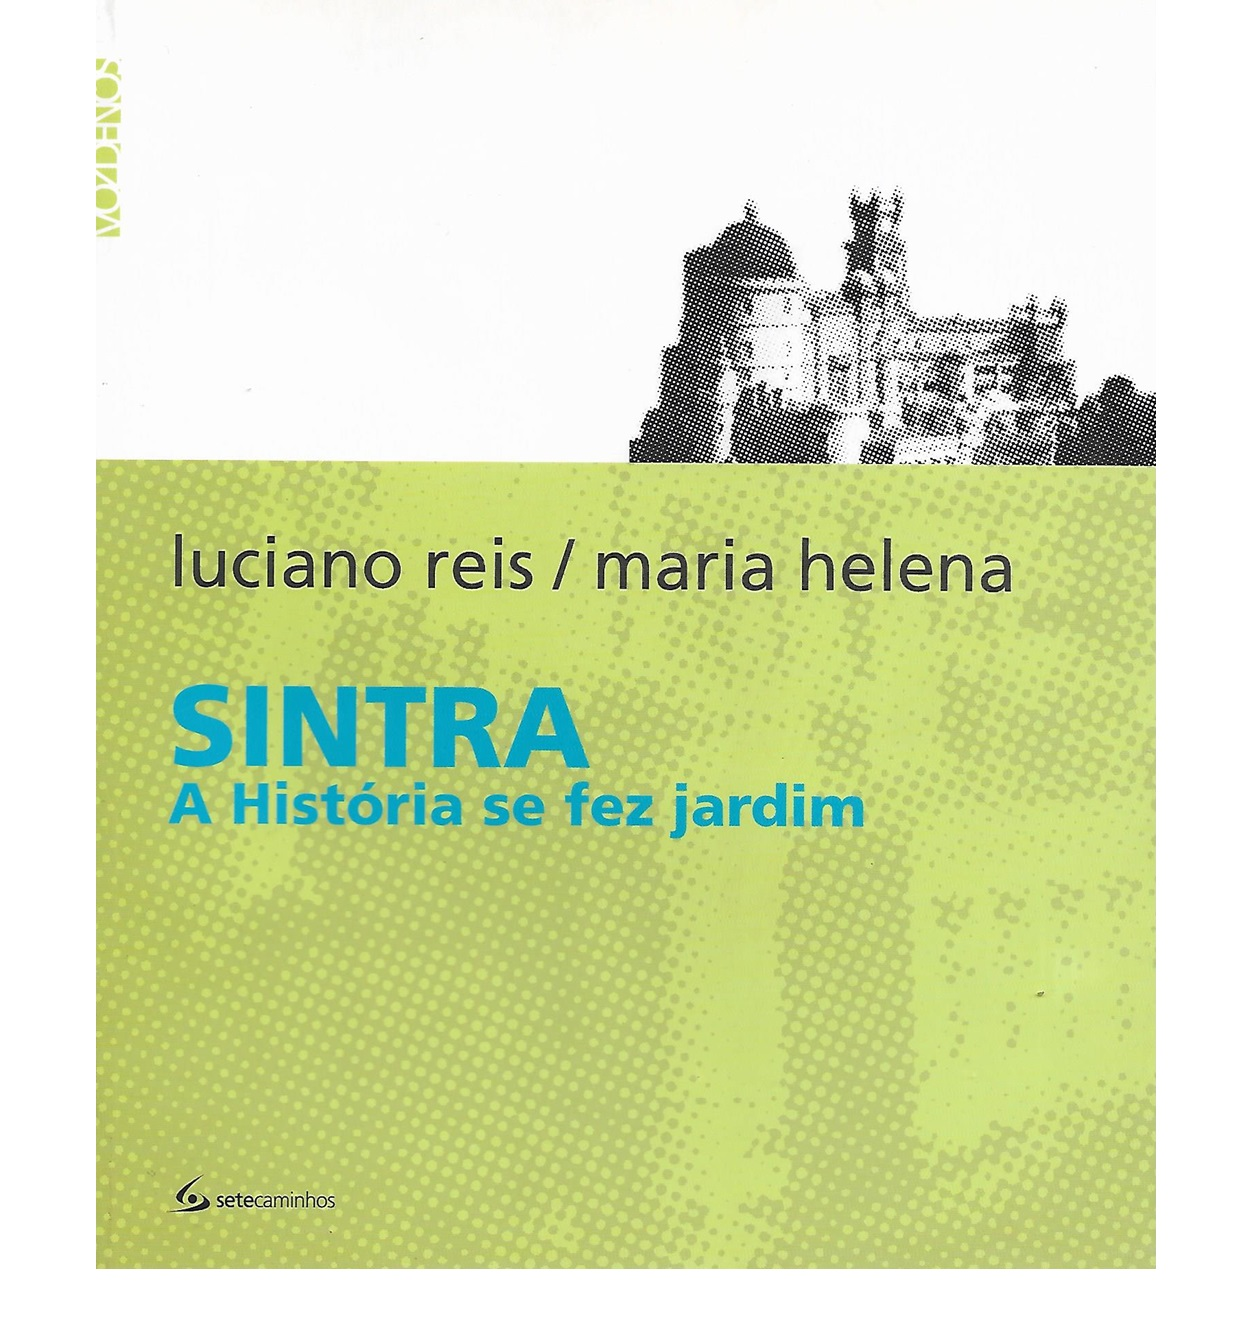 SINTRA – A HISTÓRIA SE FEZ JARDIM